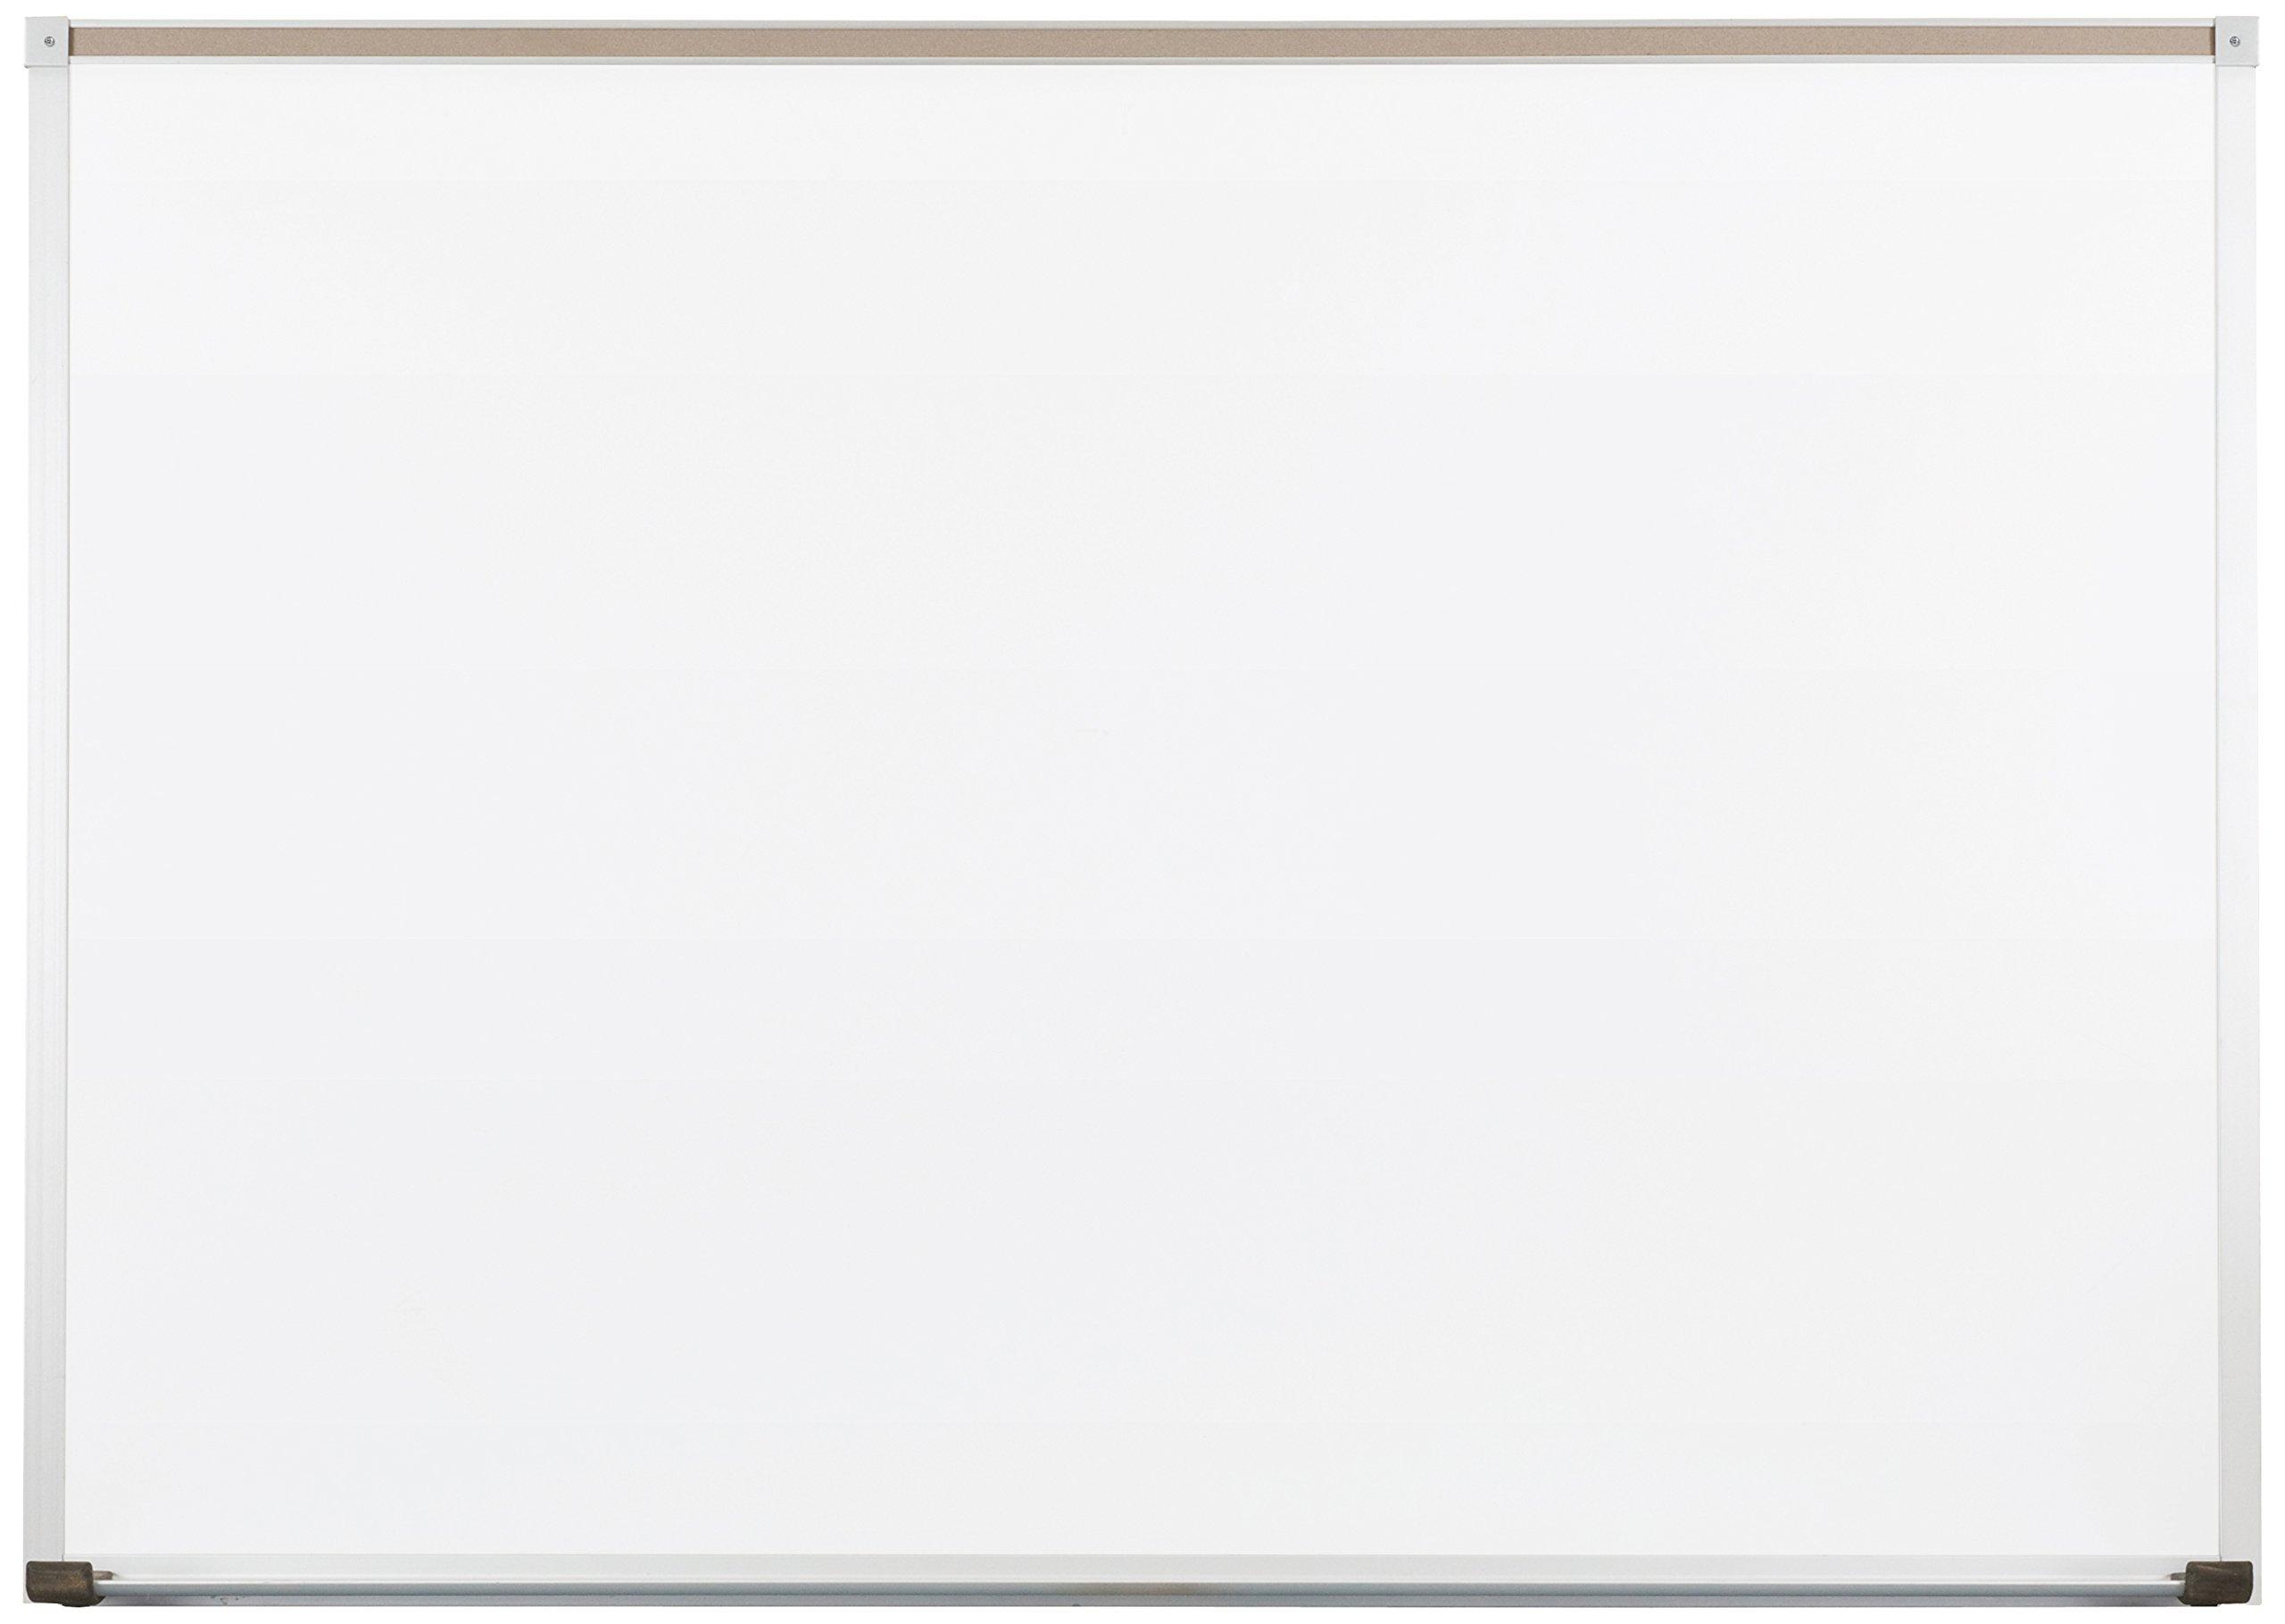 Best-Rite 212AH Deluxe Dura-Rite Dry Erase Whiteboard, Aluminum Trim & Maprail, 4 x 8 Feet by Best-Rite